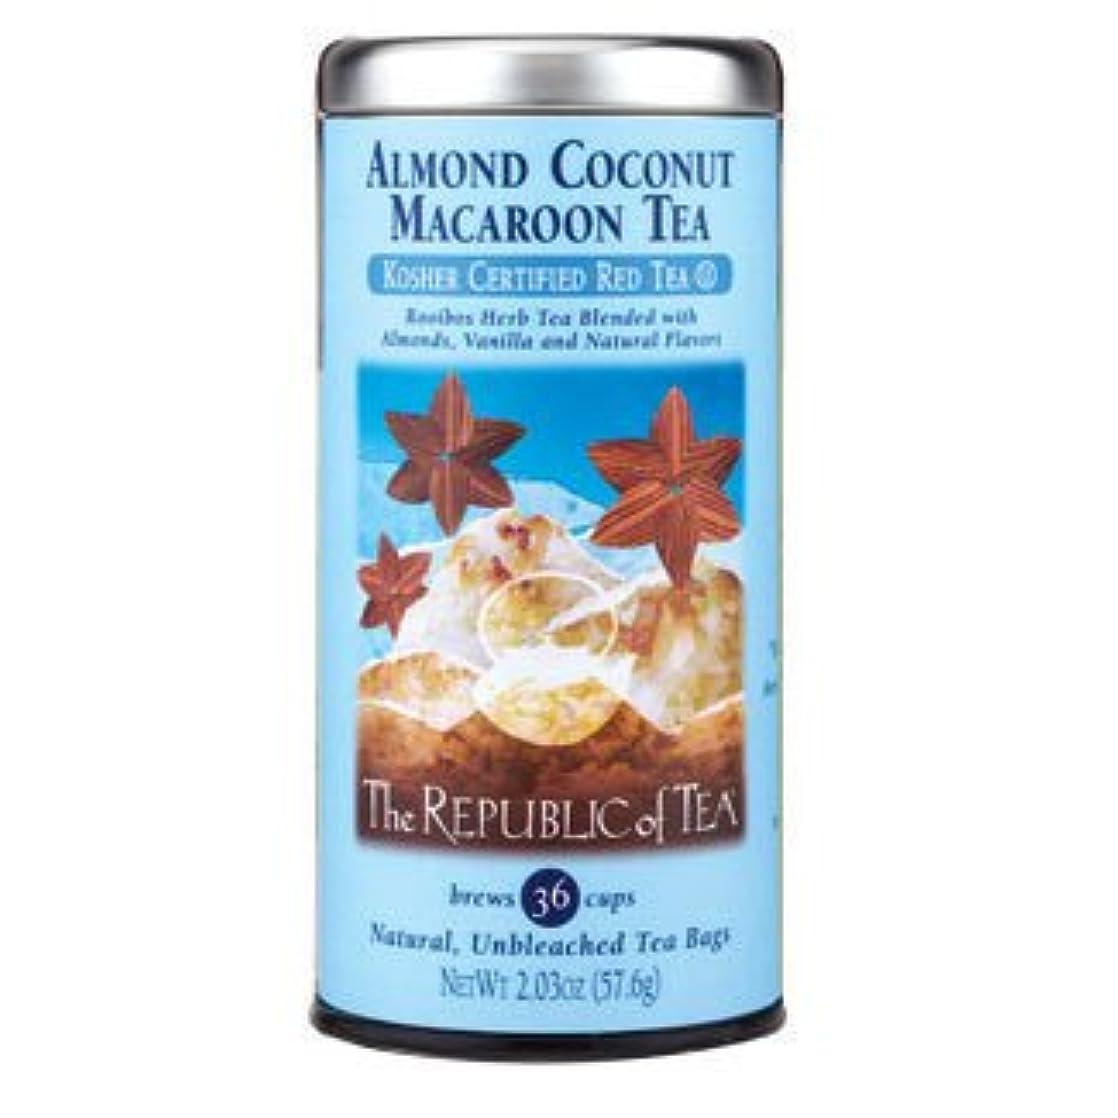 The Republic of Tea - Almond Coconut Macaroon Red Tea Bags, 36 Tea Bags (Pack of 3) hugdiixq67941